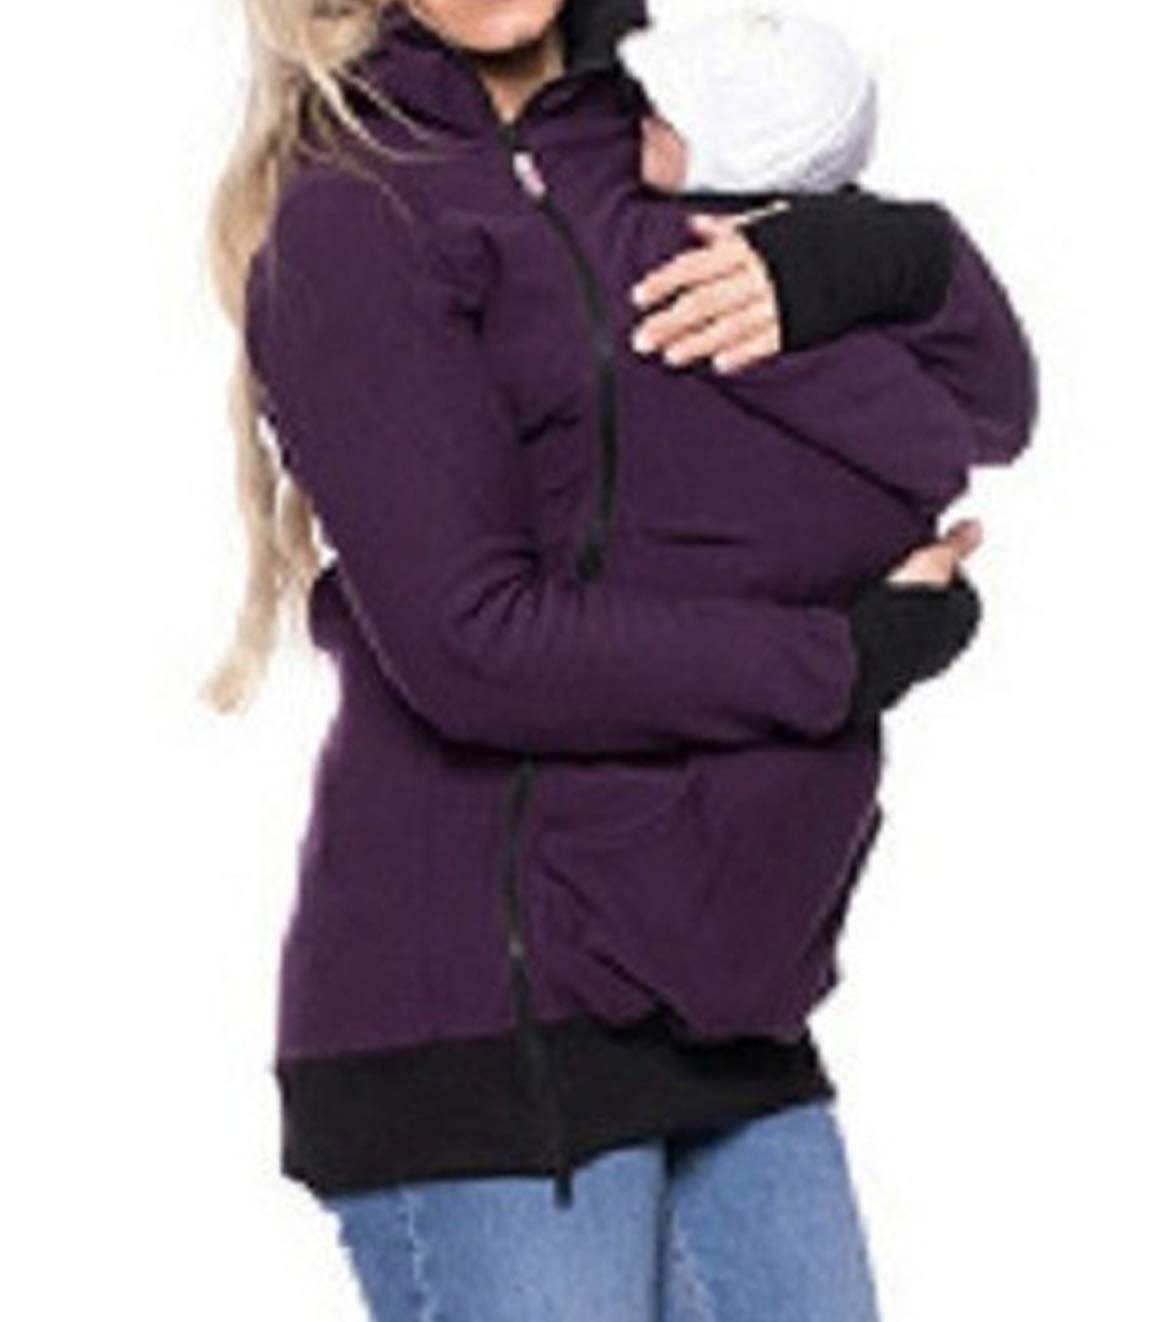 Astage Woman Jacket Mama Maternity Pregnant Hoodie Baby Wrap Sling Hooded Sweatshirt